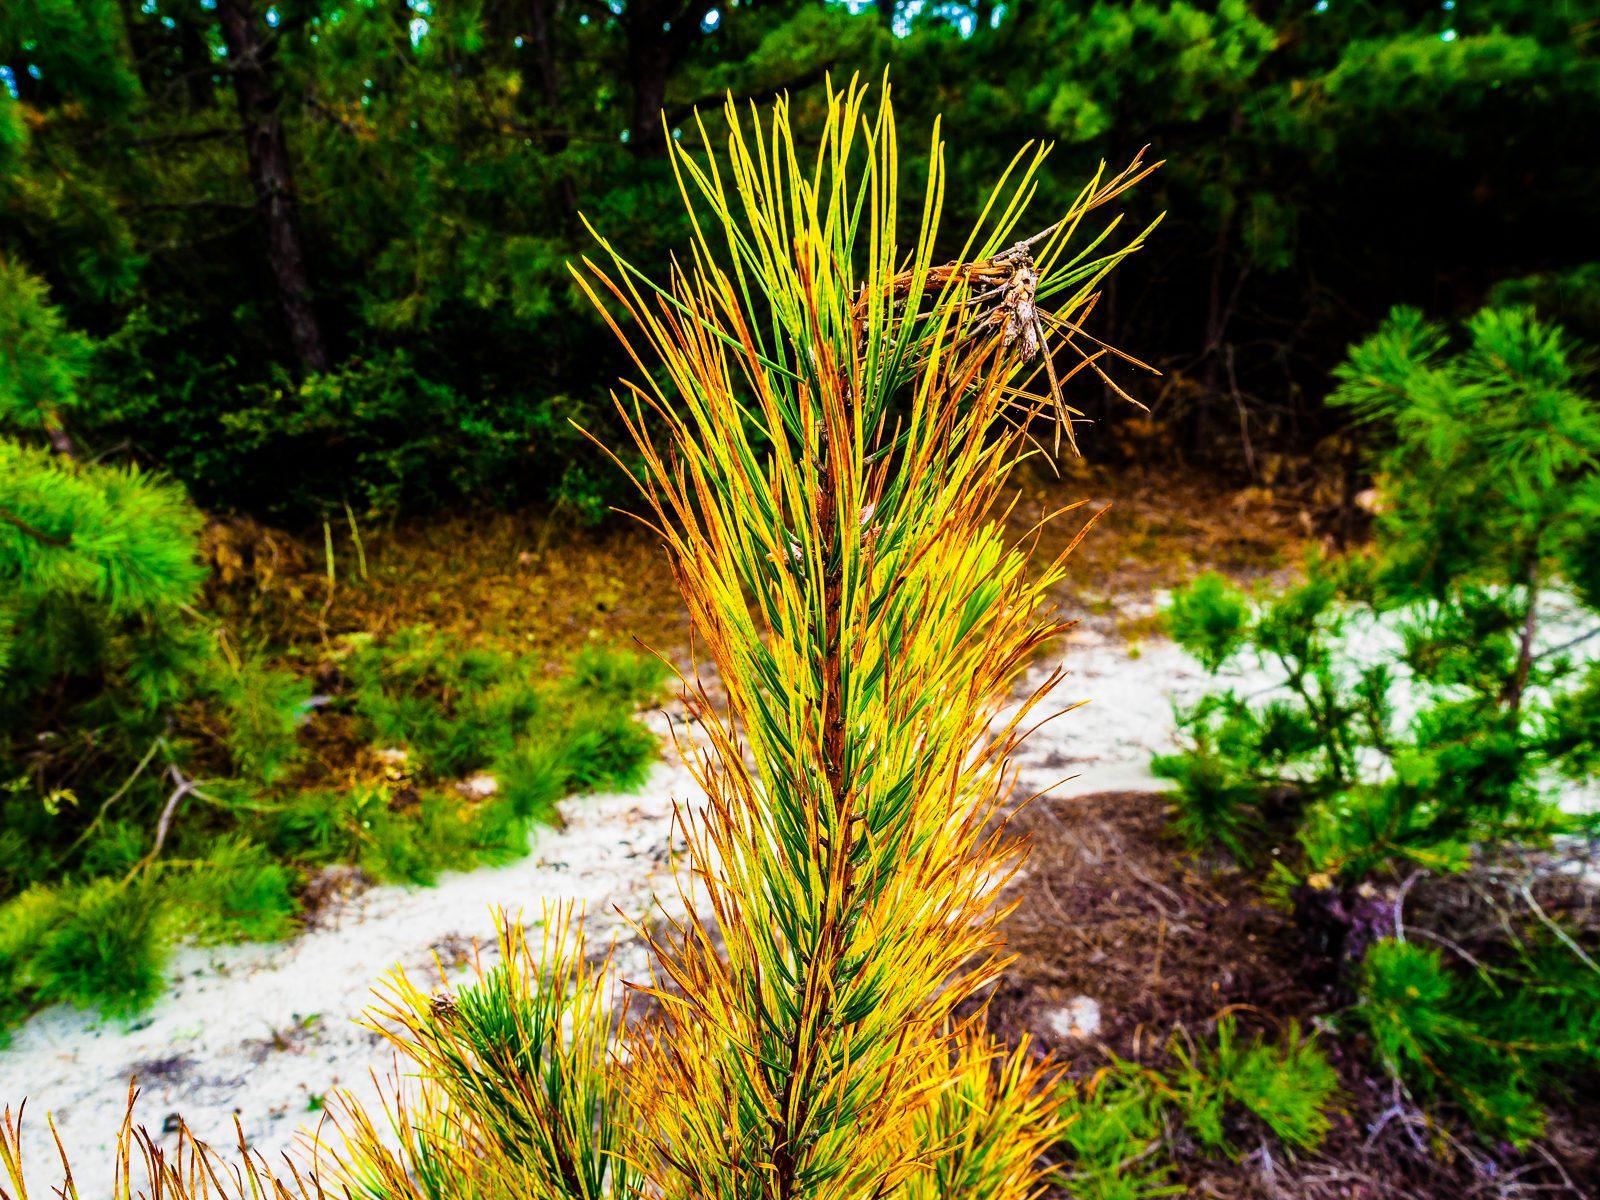 pinelands-needle-color-020056